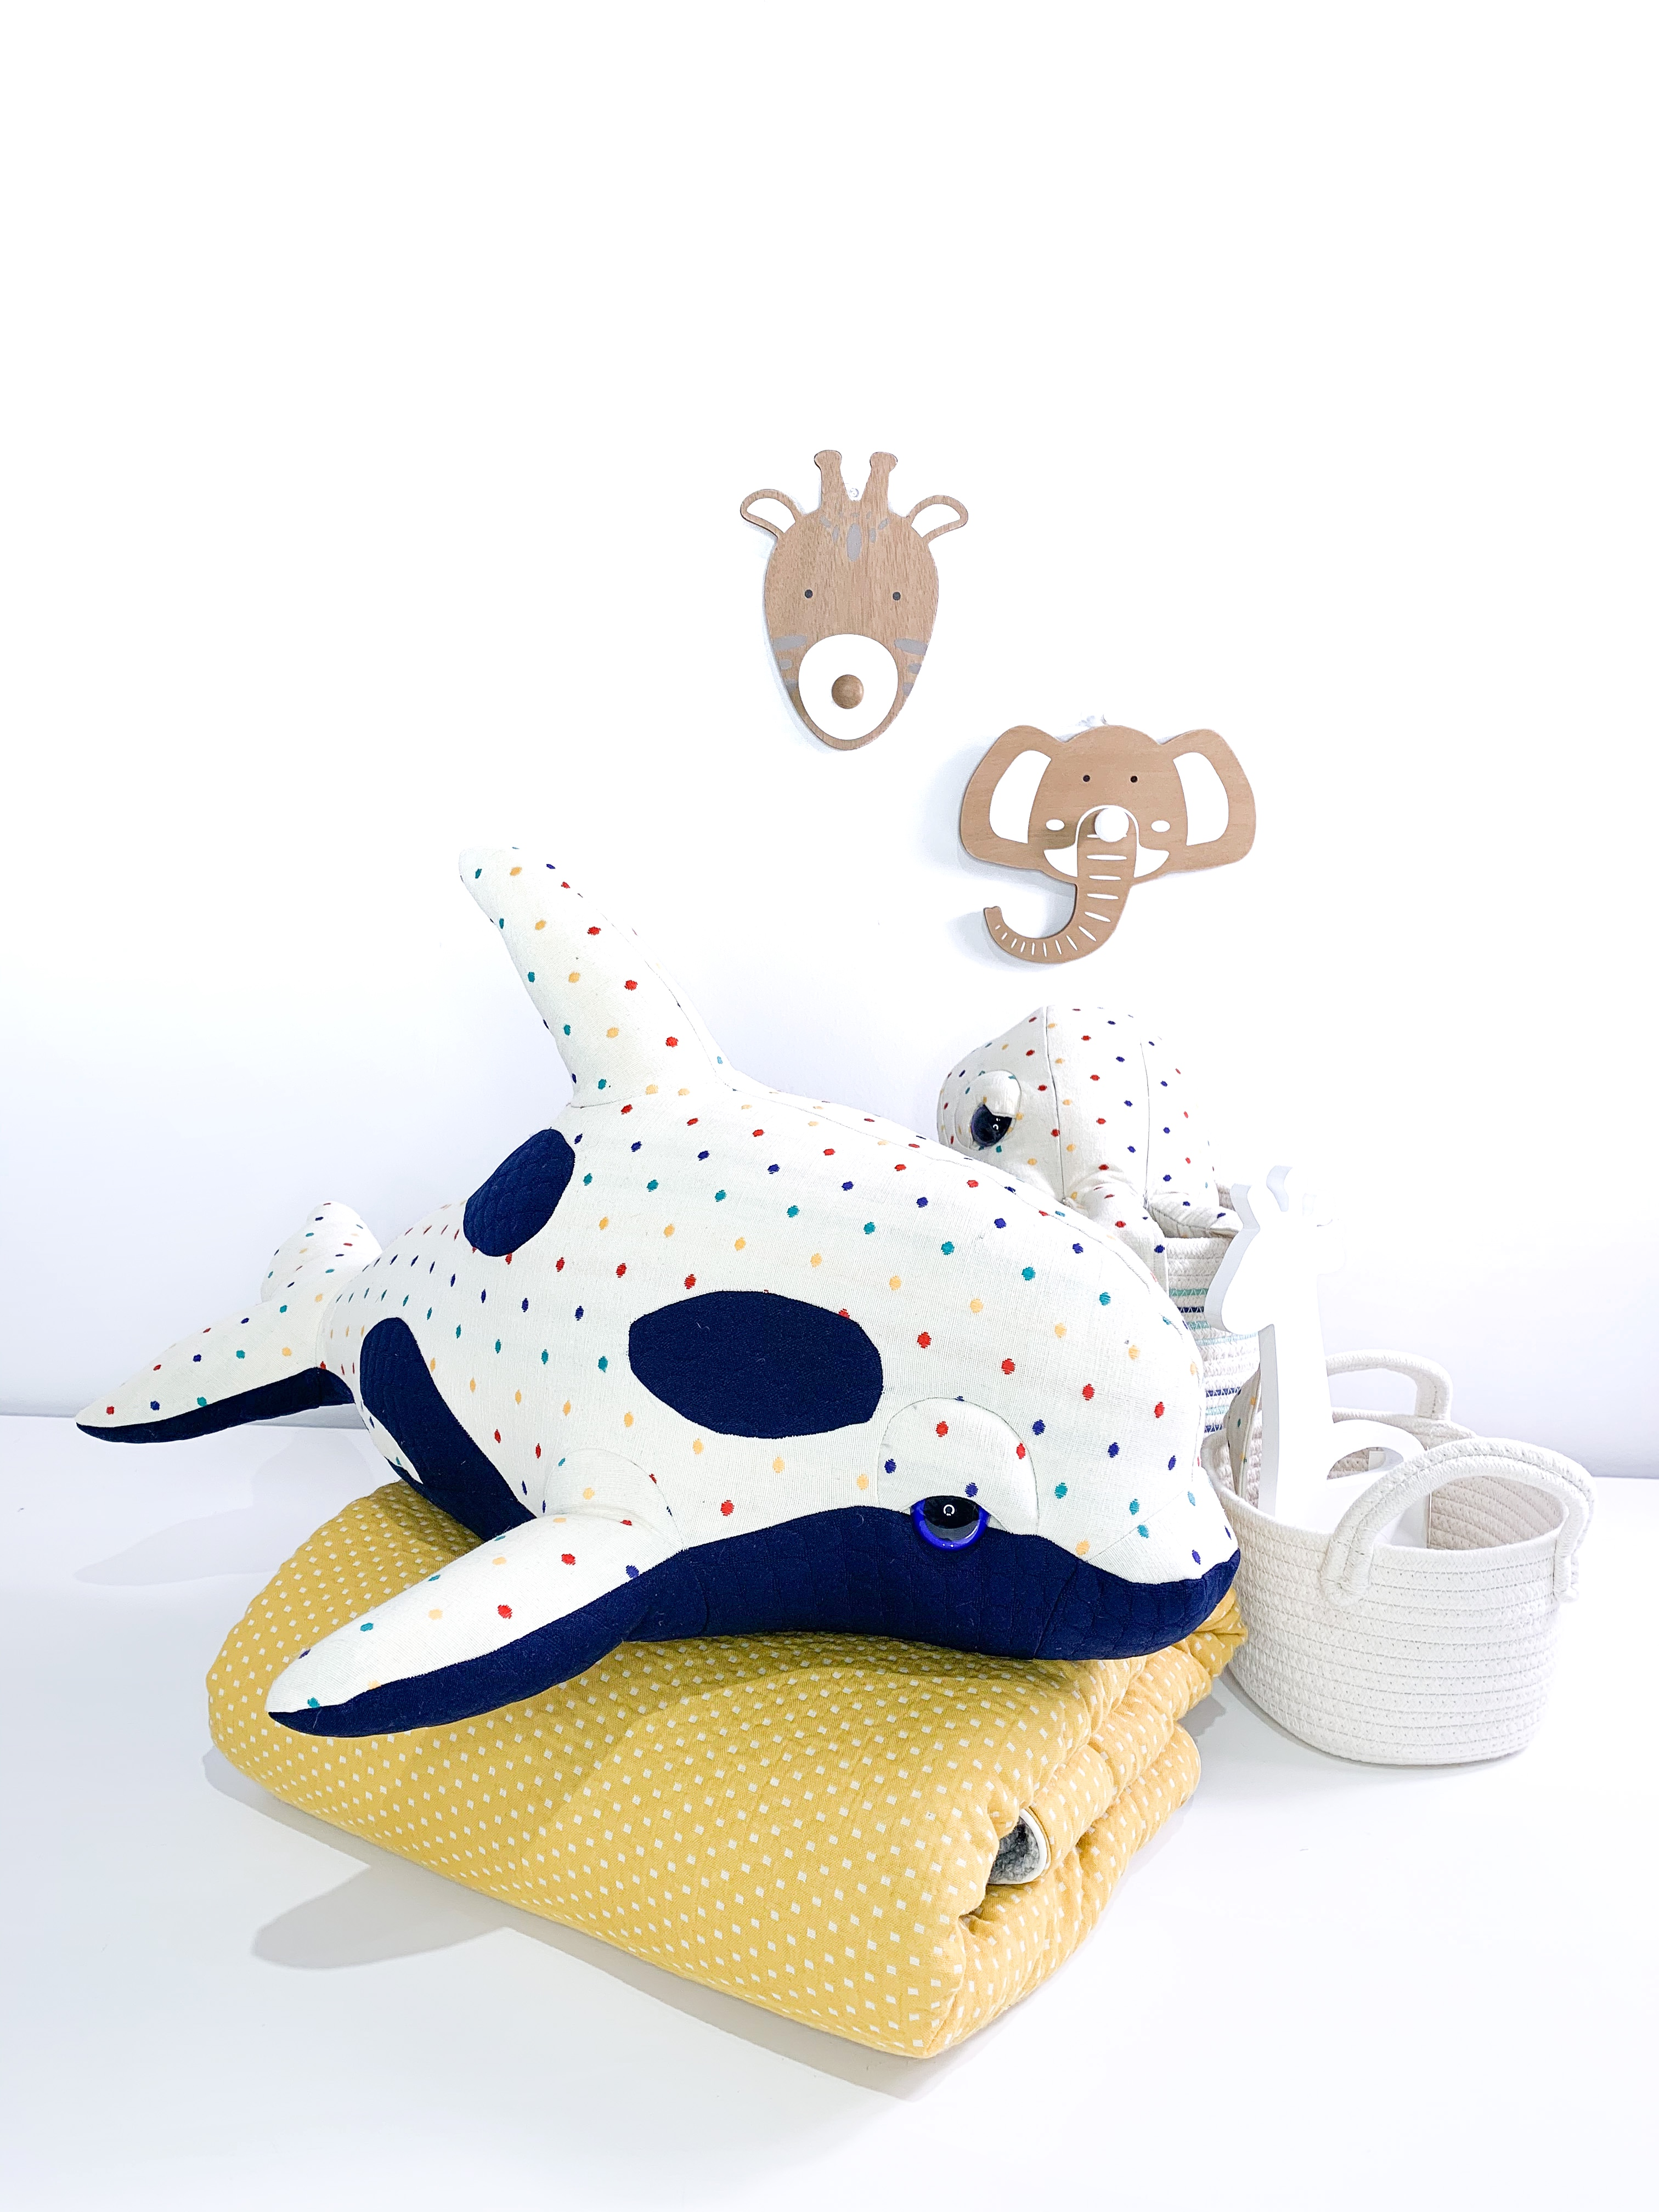 Polka Baby Orca Plush - Handmade Killer